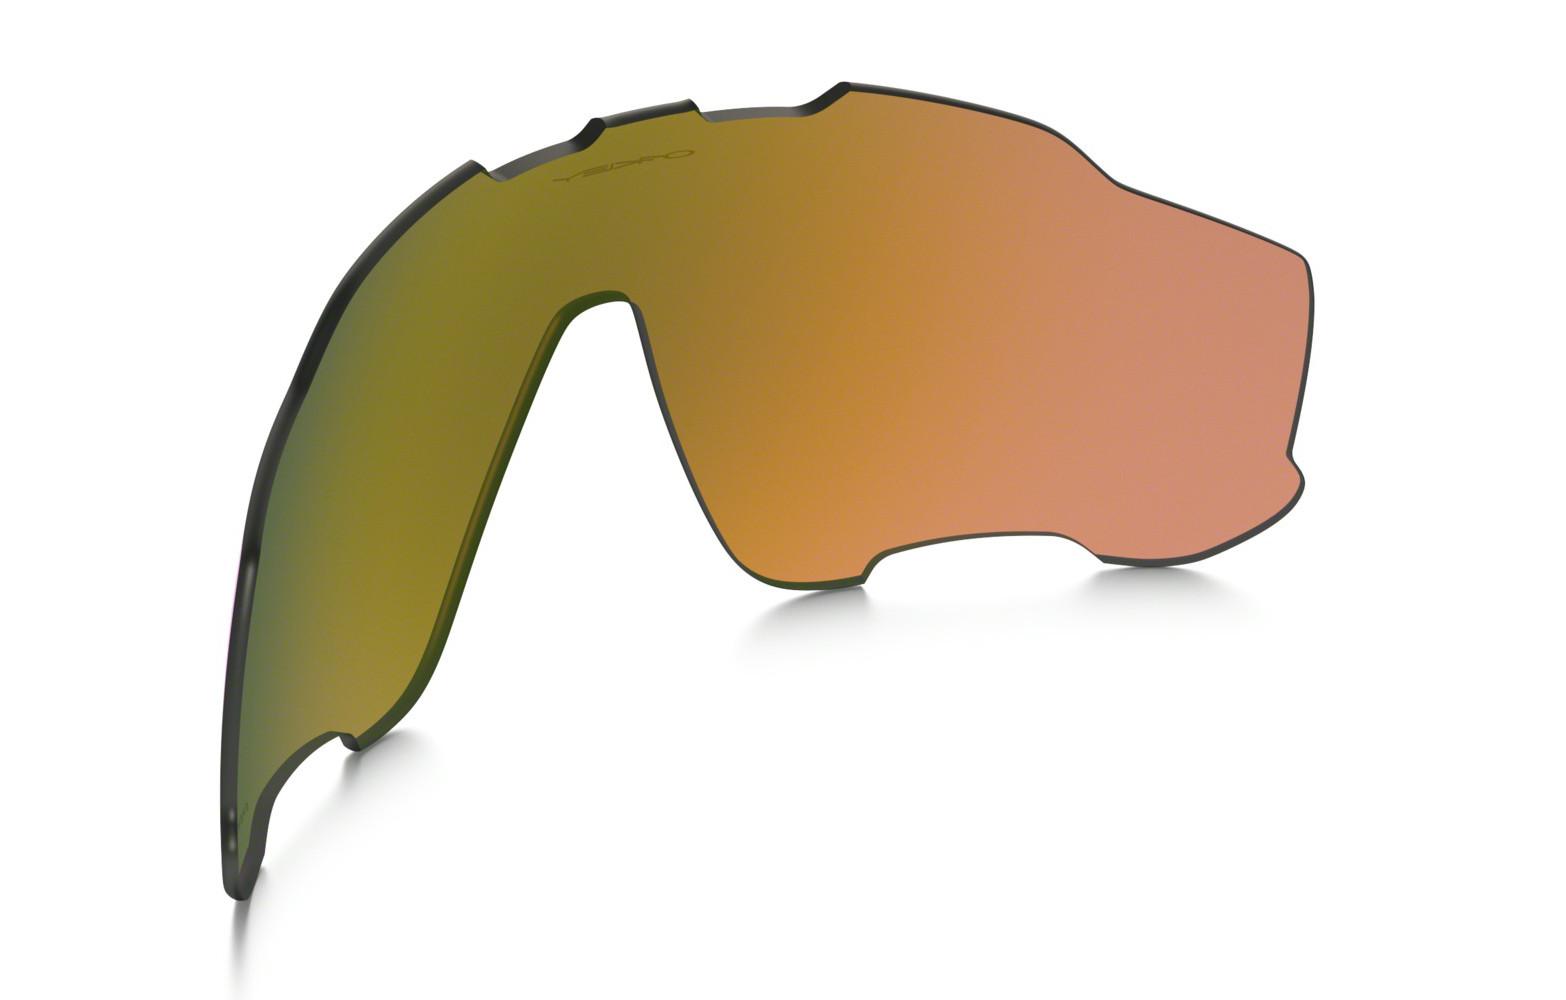 OAKLEY Lente per occhiali JAWBREAKER PRIZM TRAIL Riferimento 101 111 008